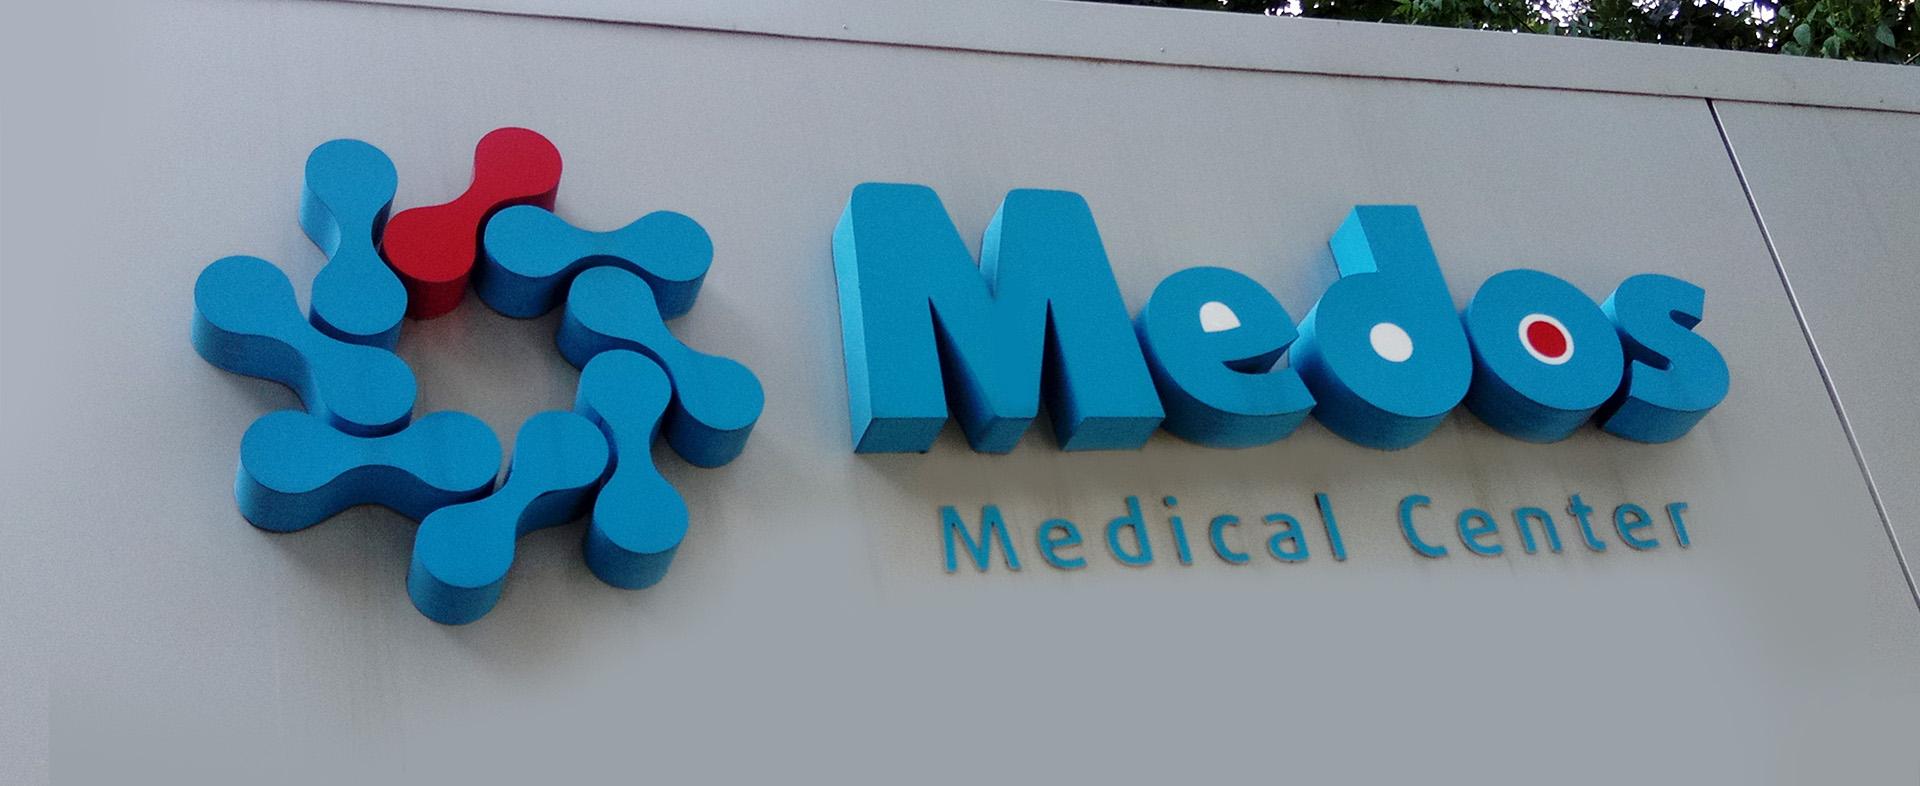 Logo Design центра остеопатии, chiropractic center logo design